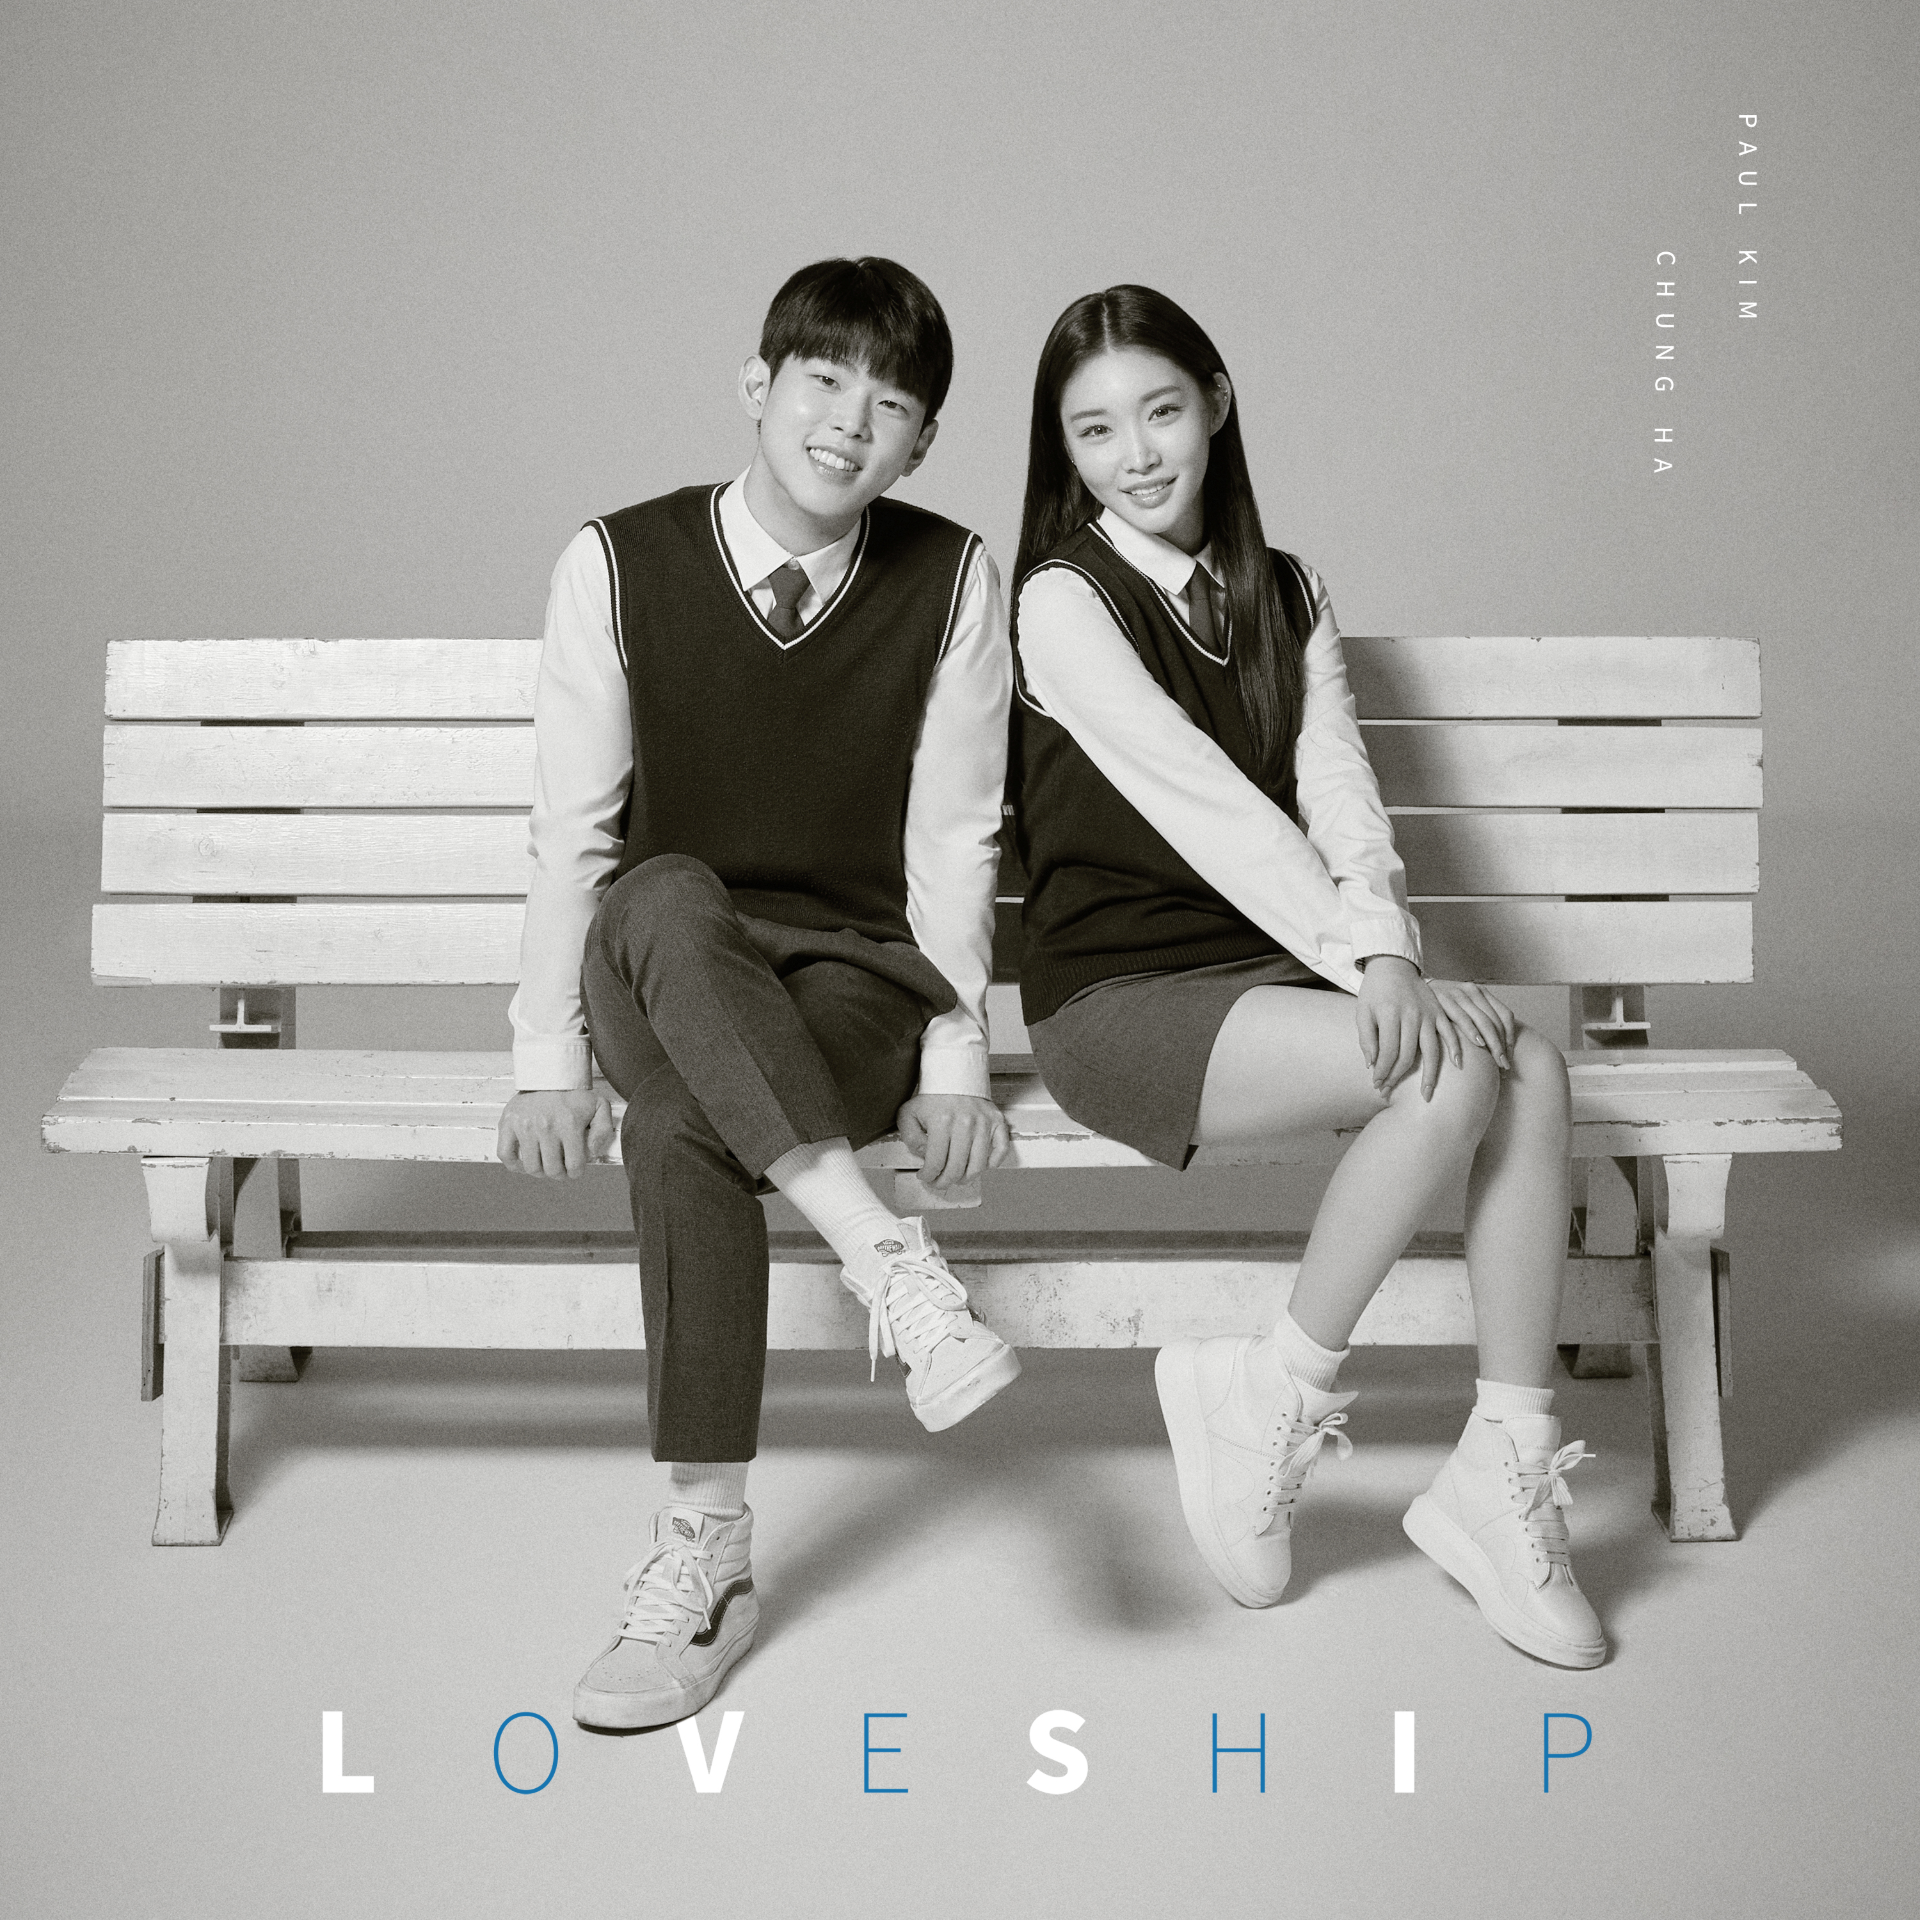 Loveship album cover.png